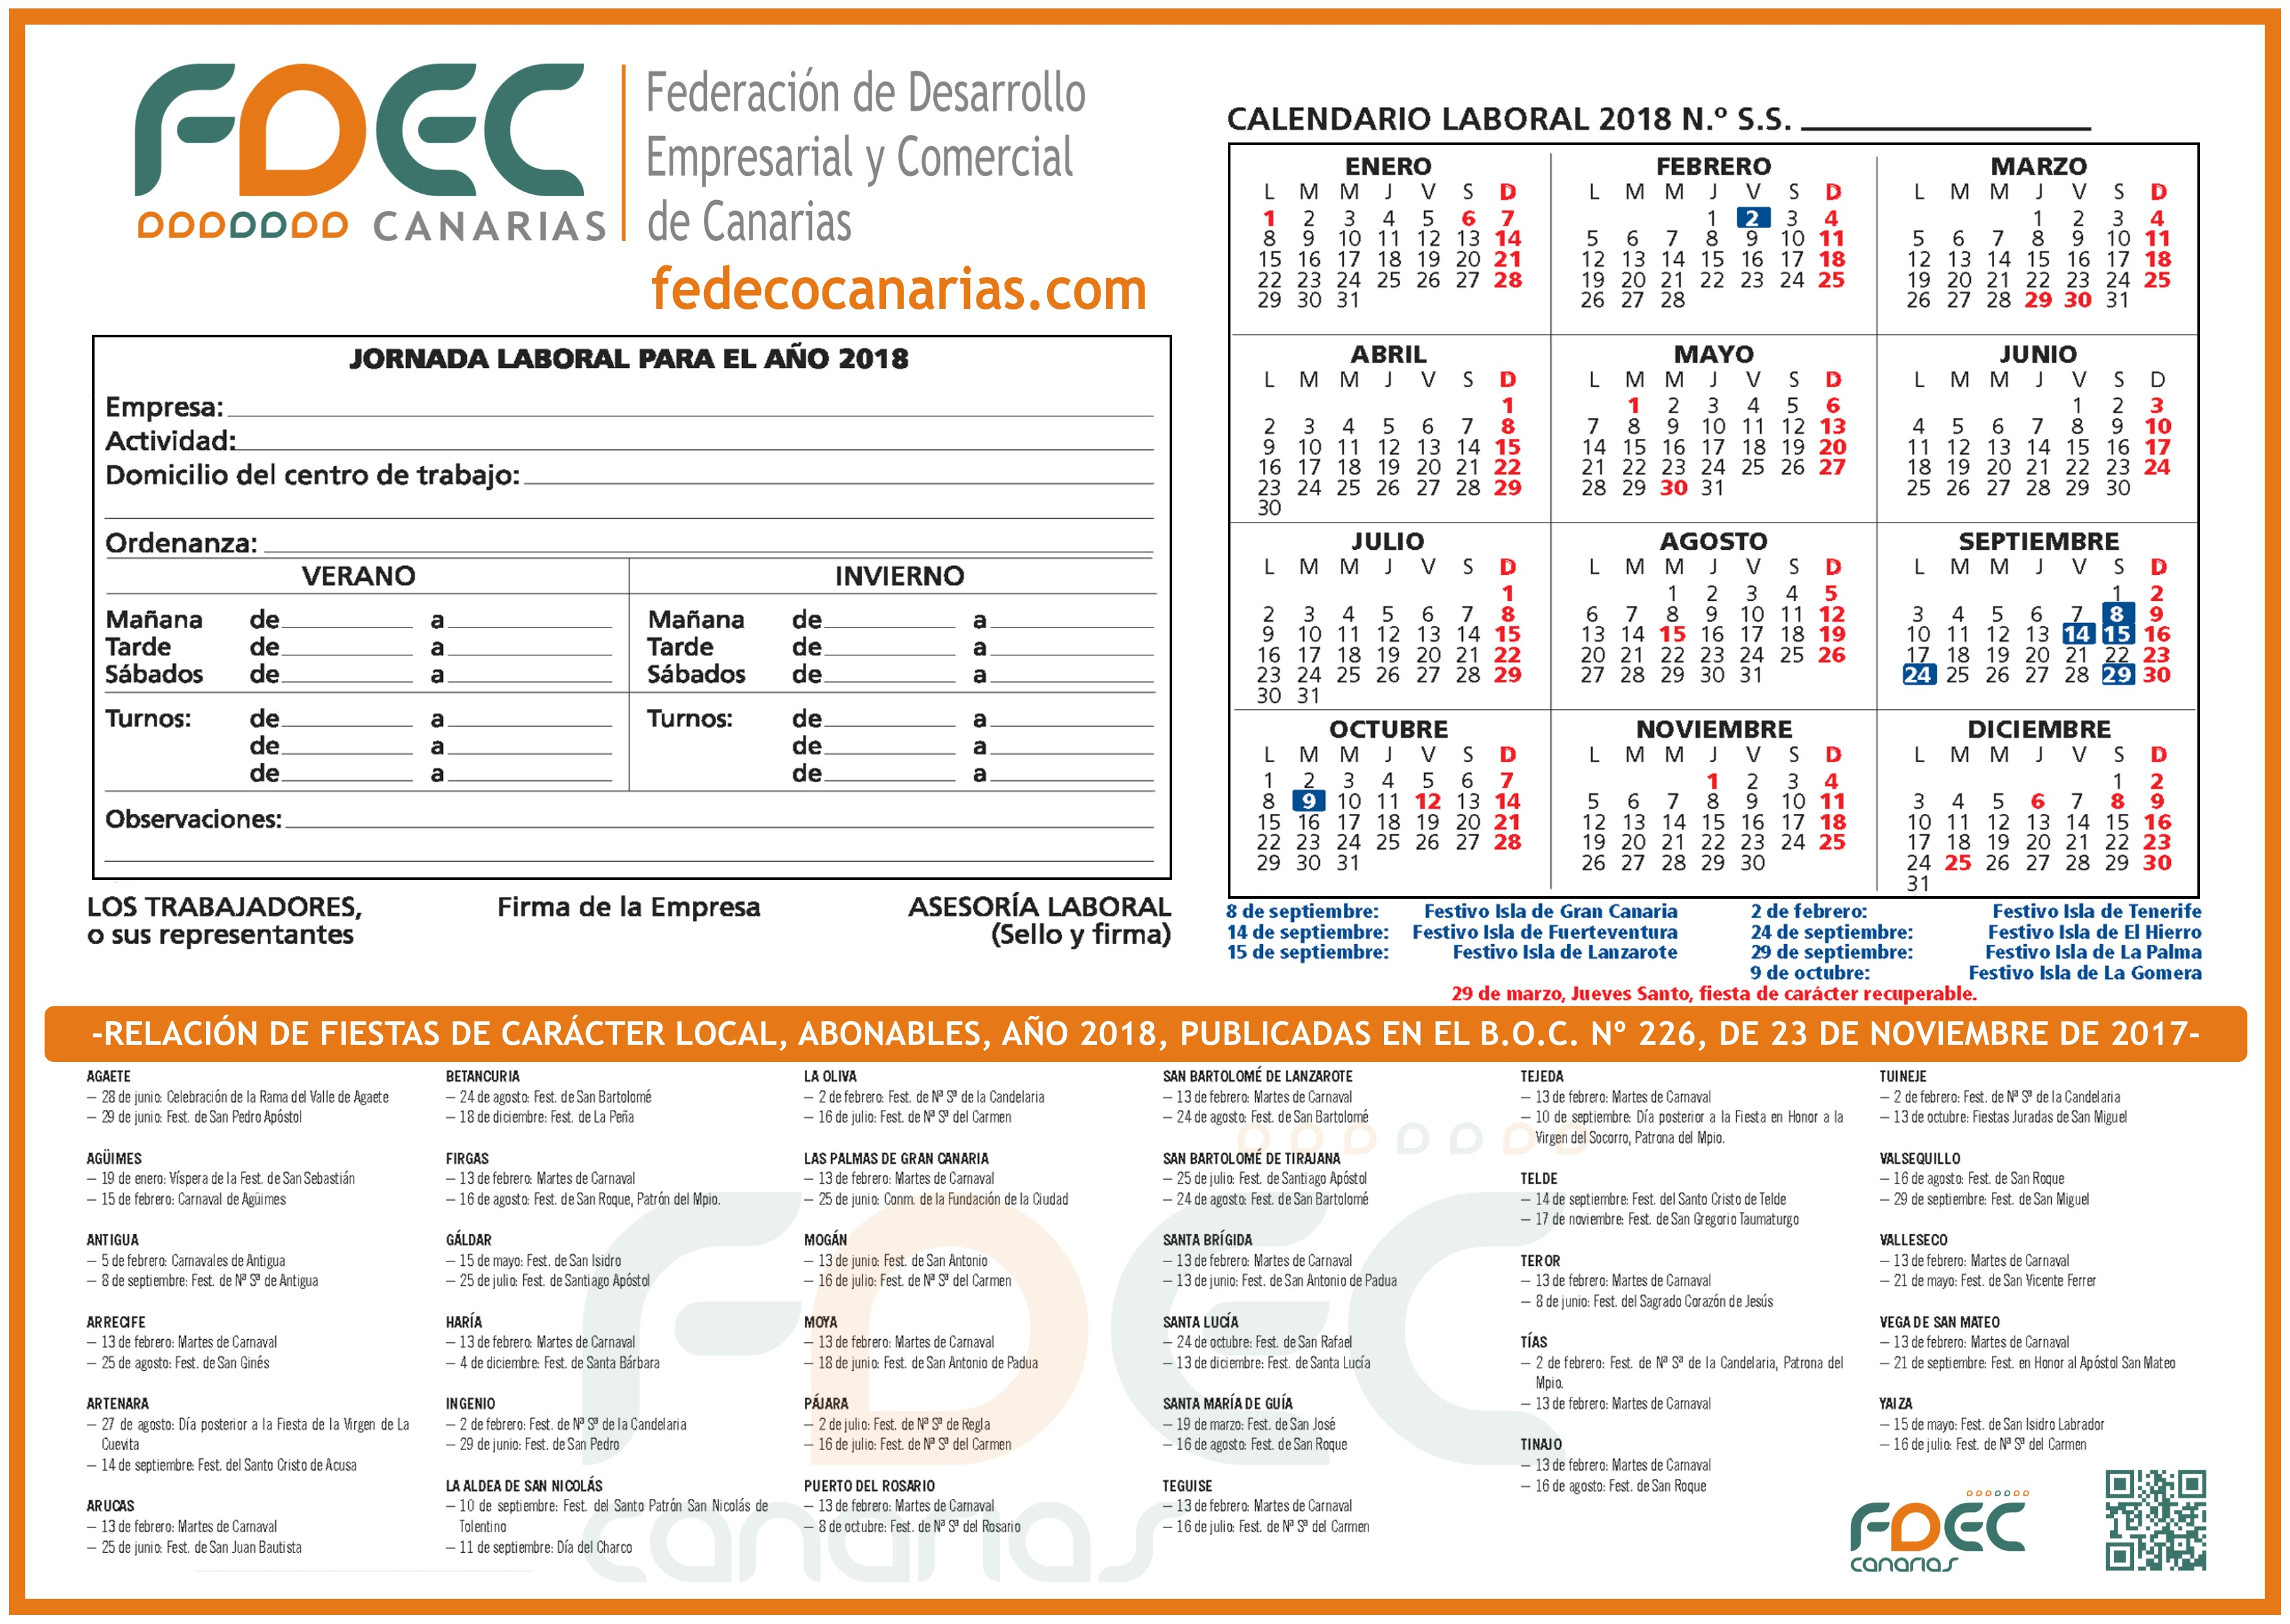 Calendario Laboral FDEC - GRAN CANARIA 2018